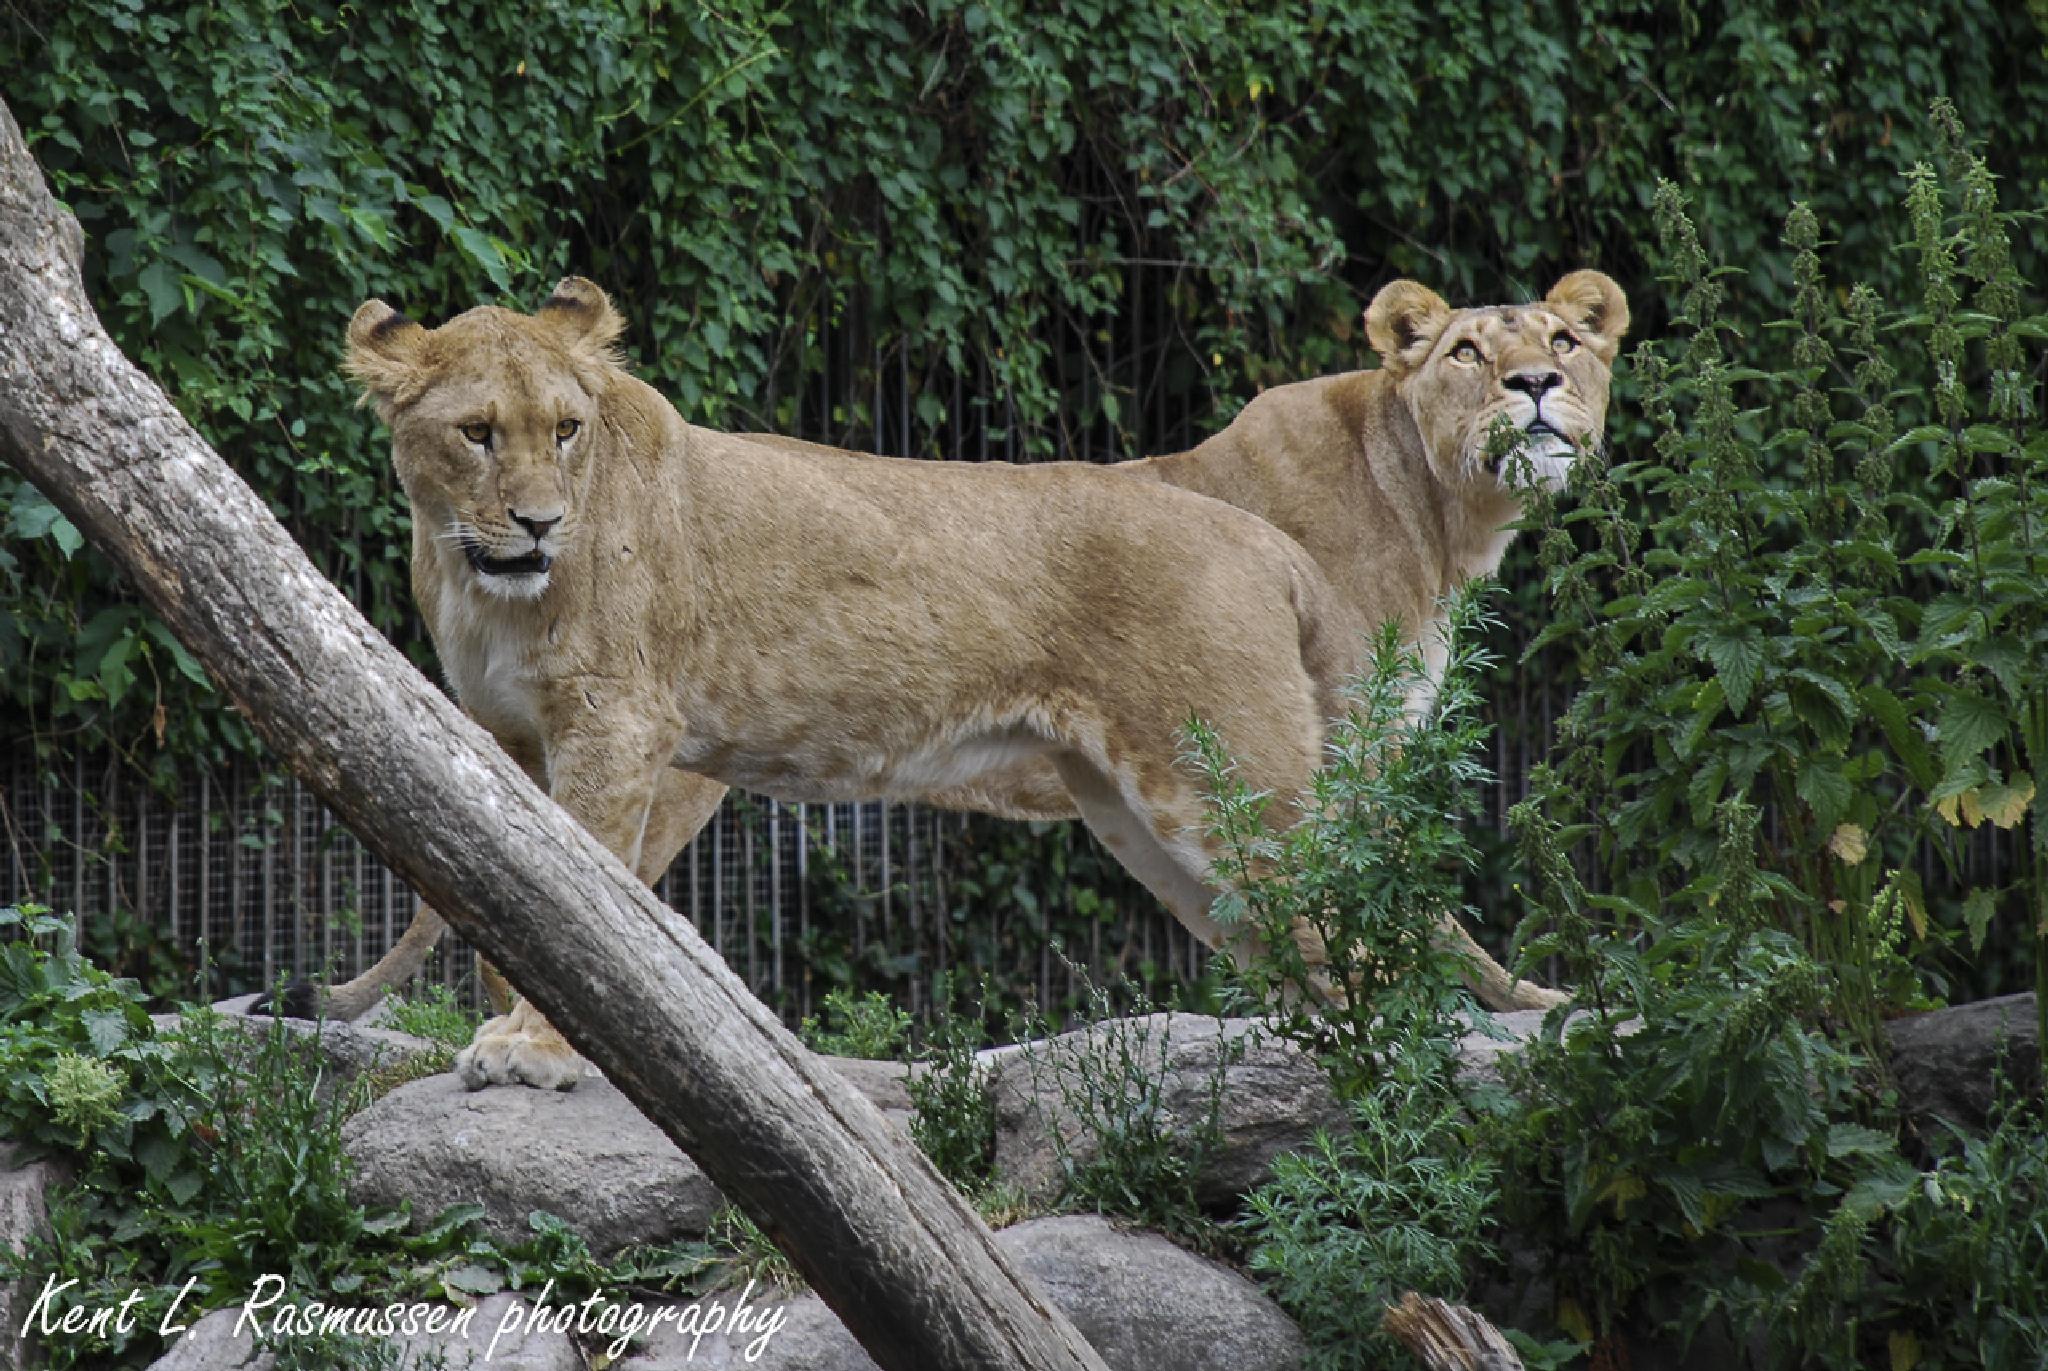 Double Lion by Kent L. Rasmussen